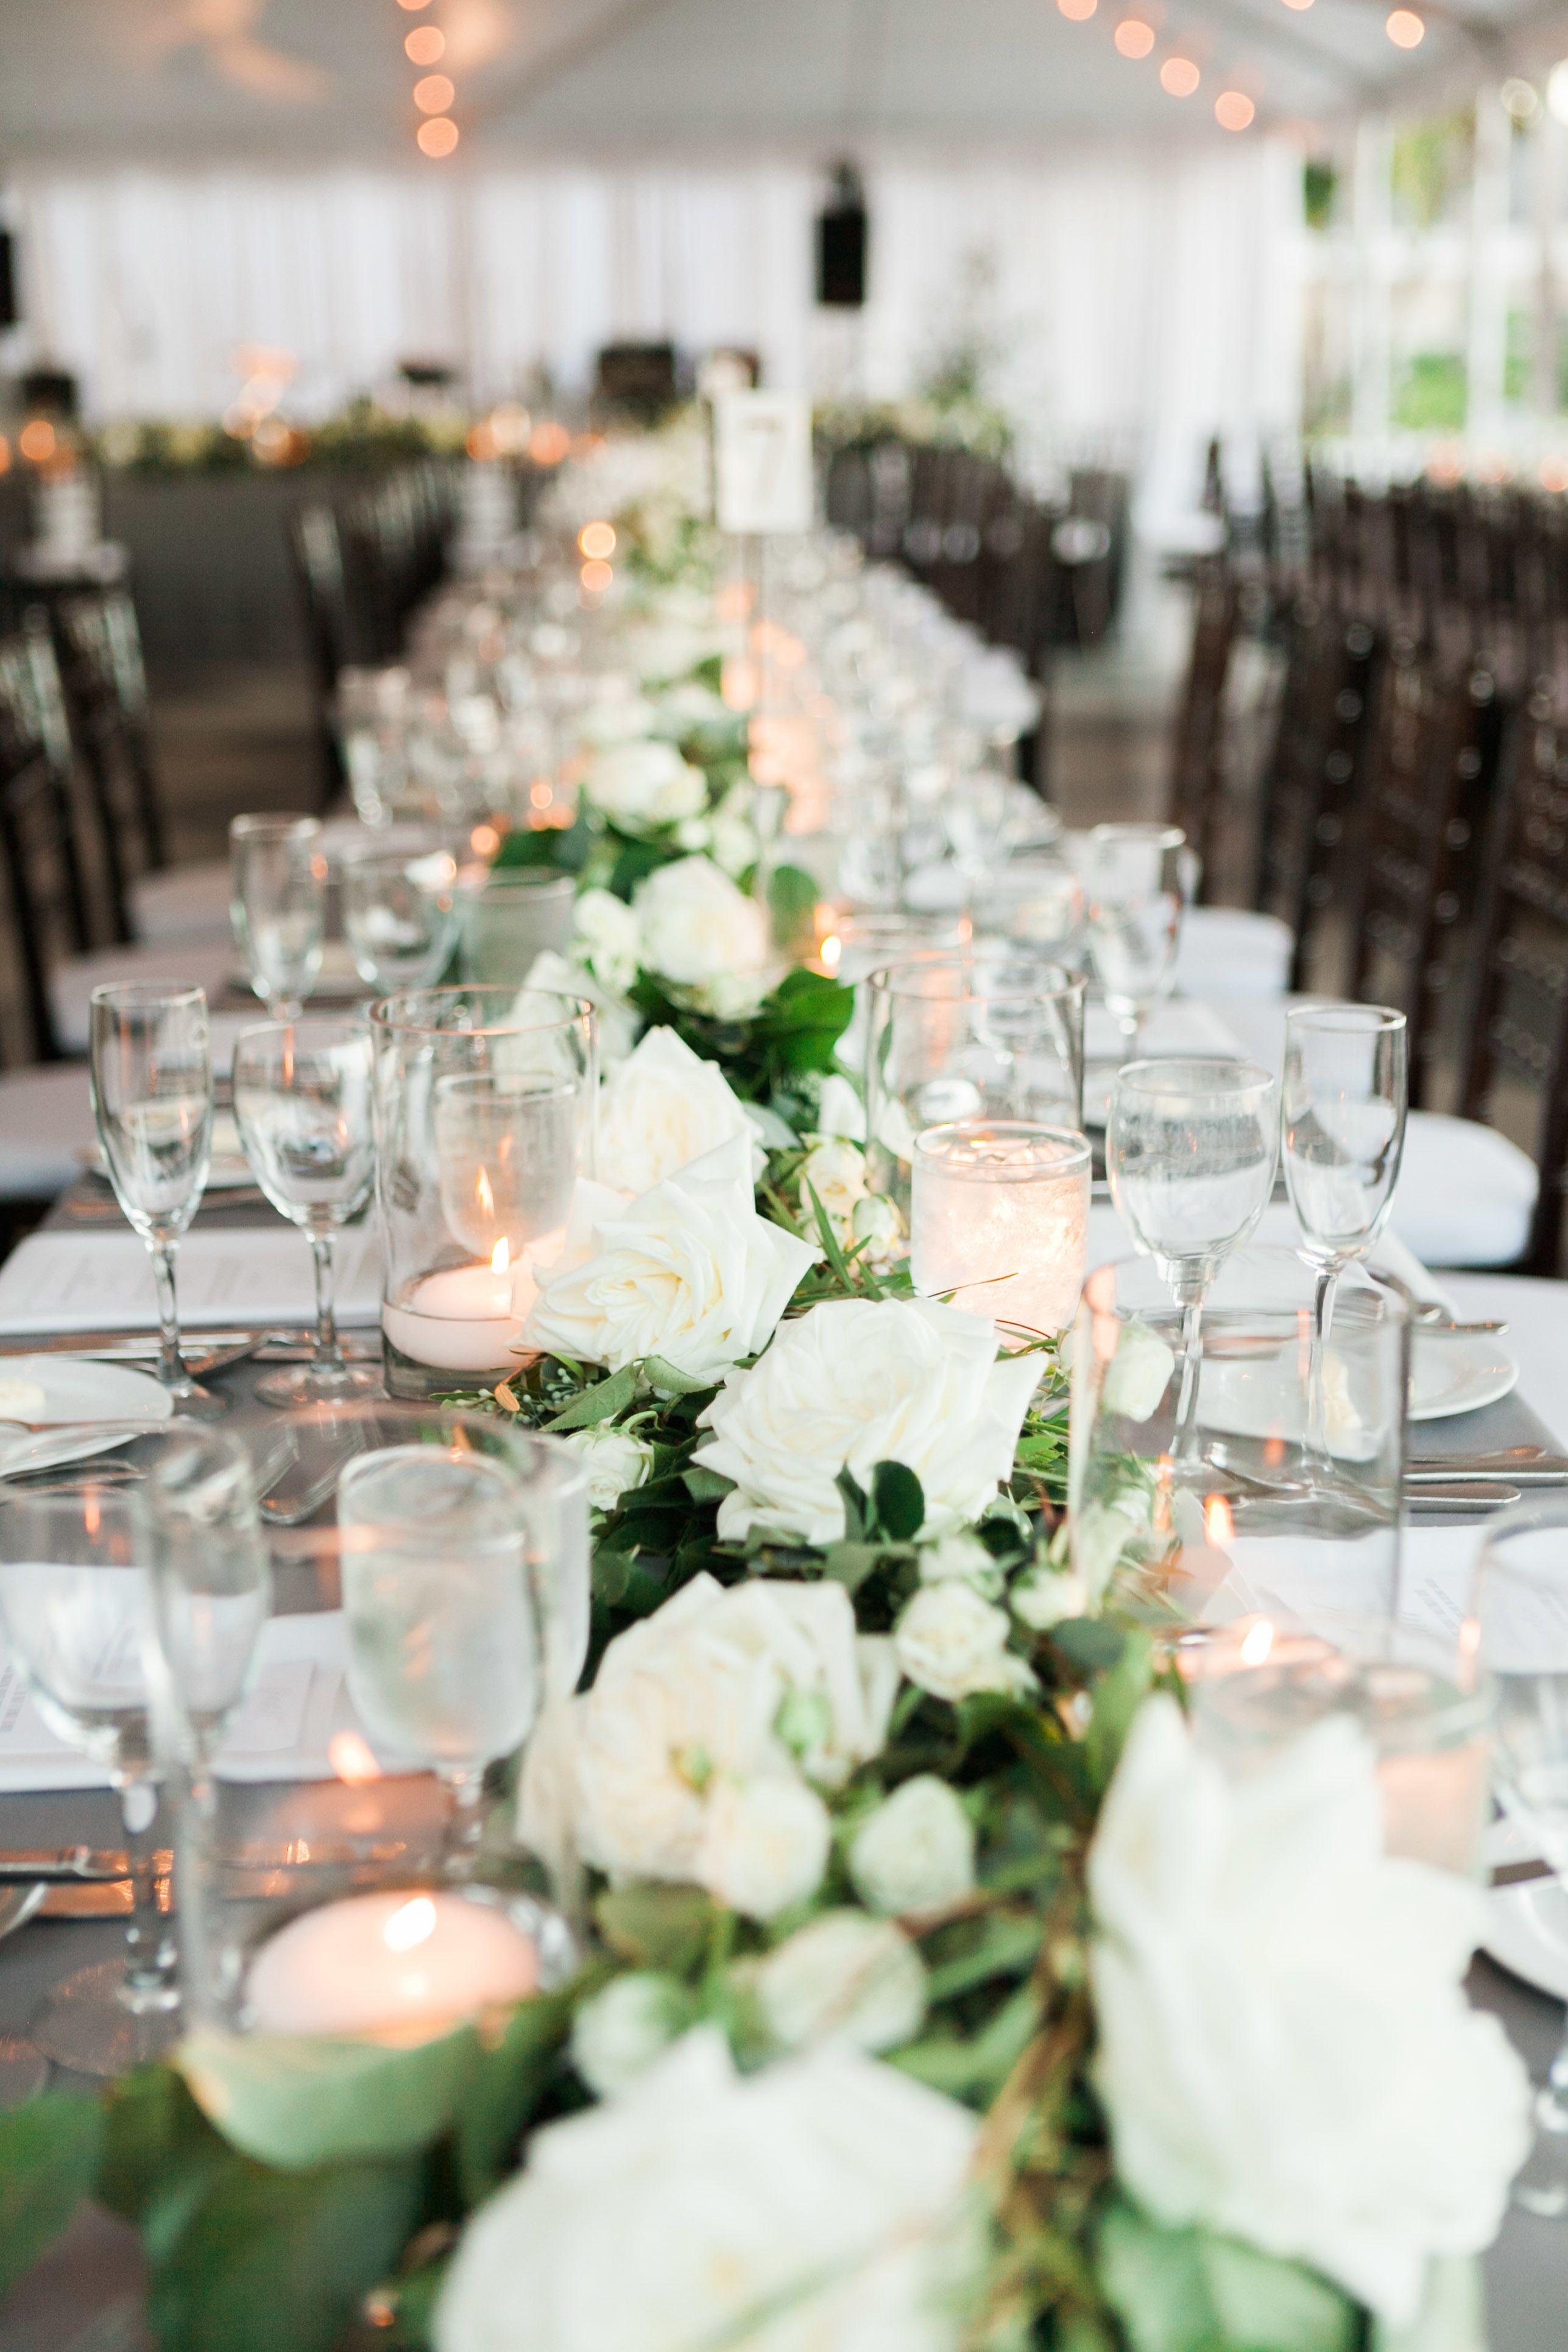 Yacht wedding decorations  Rustic and Elegant Tampa Yacht Club Wedding  Yacht club Wedding